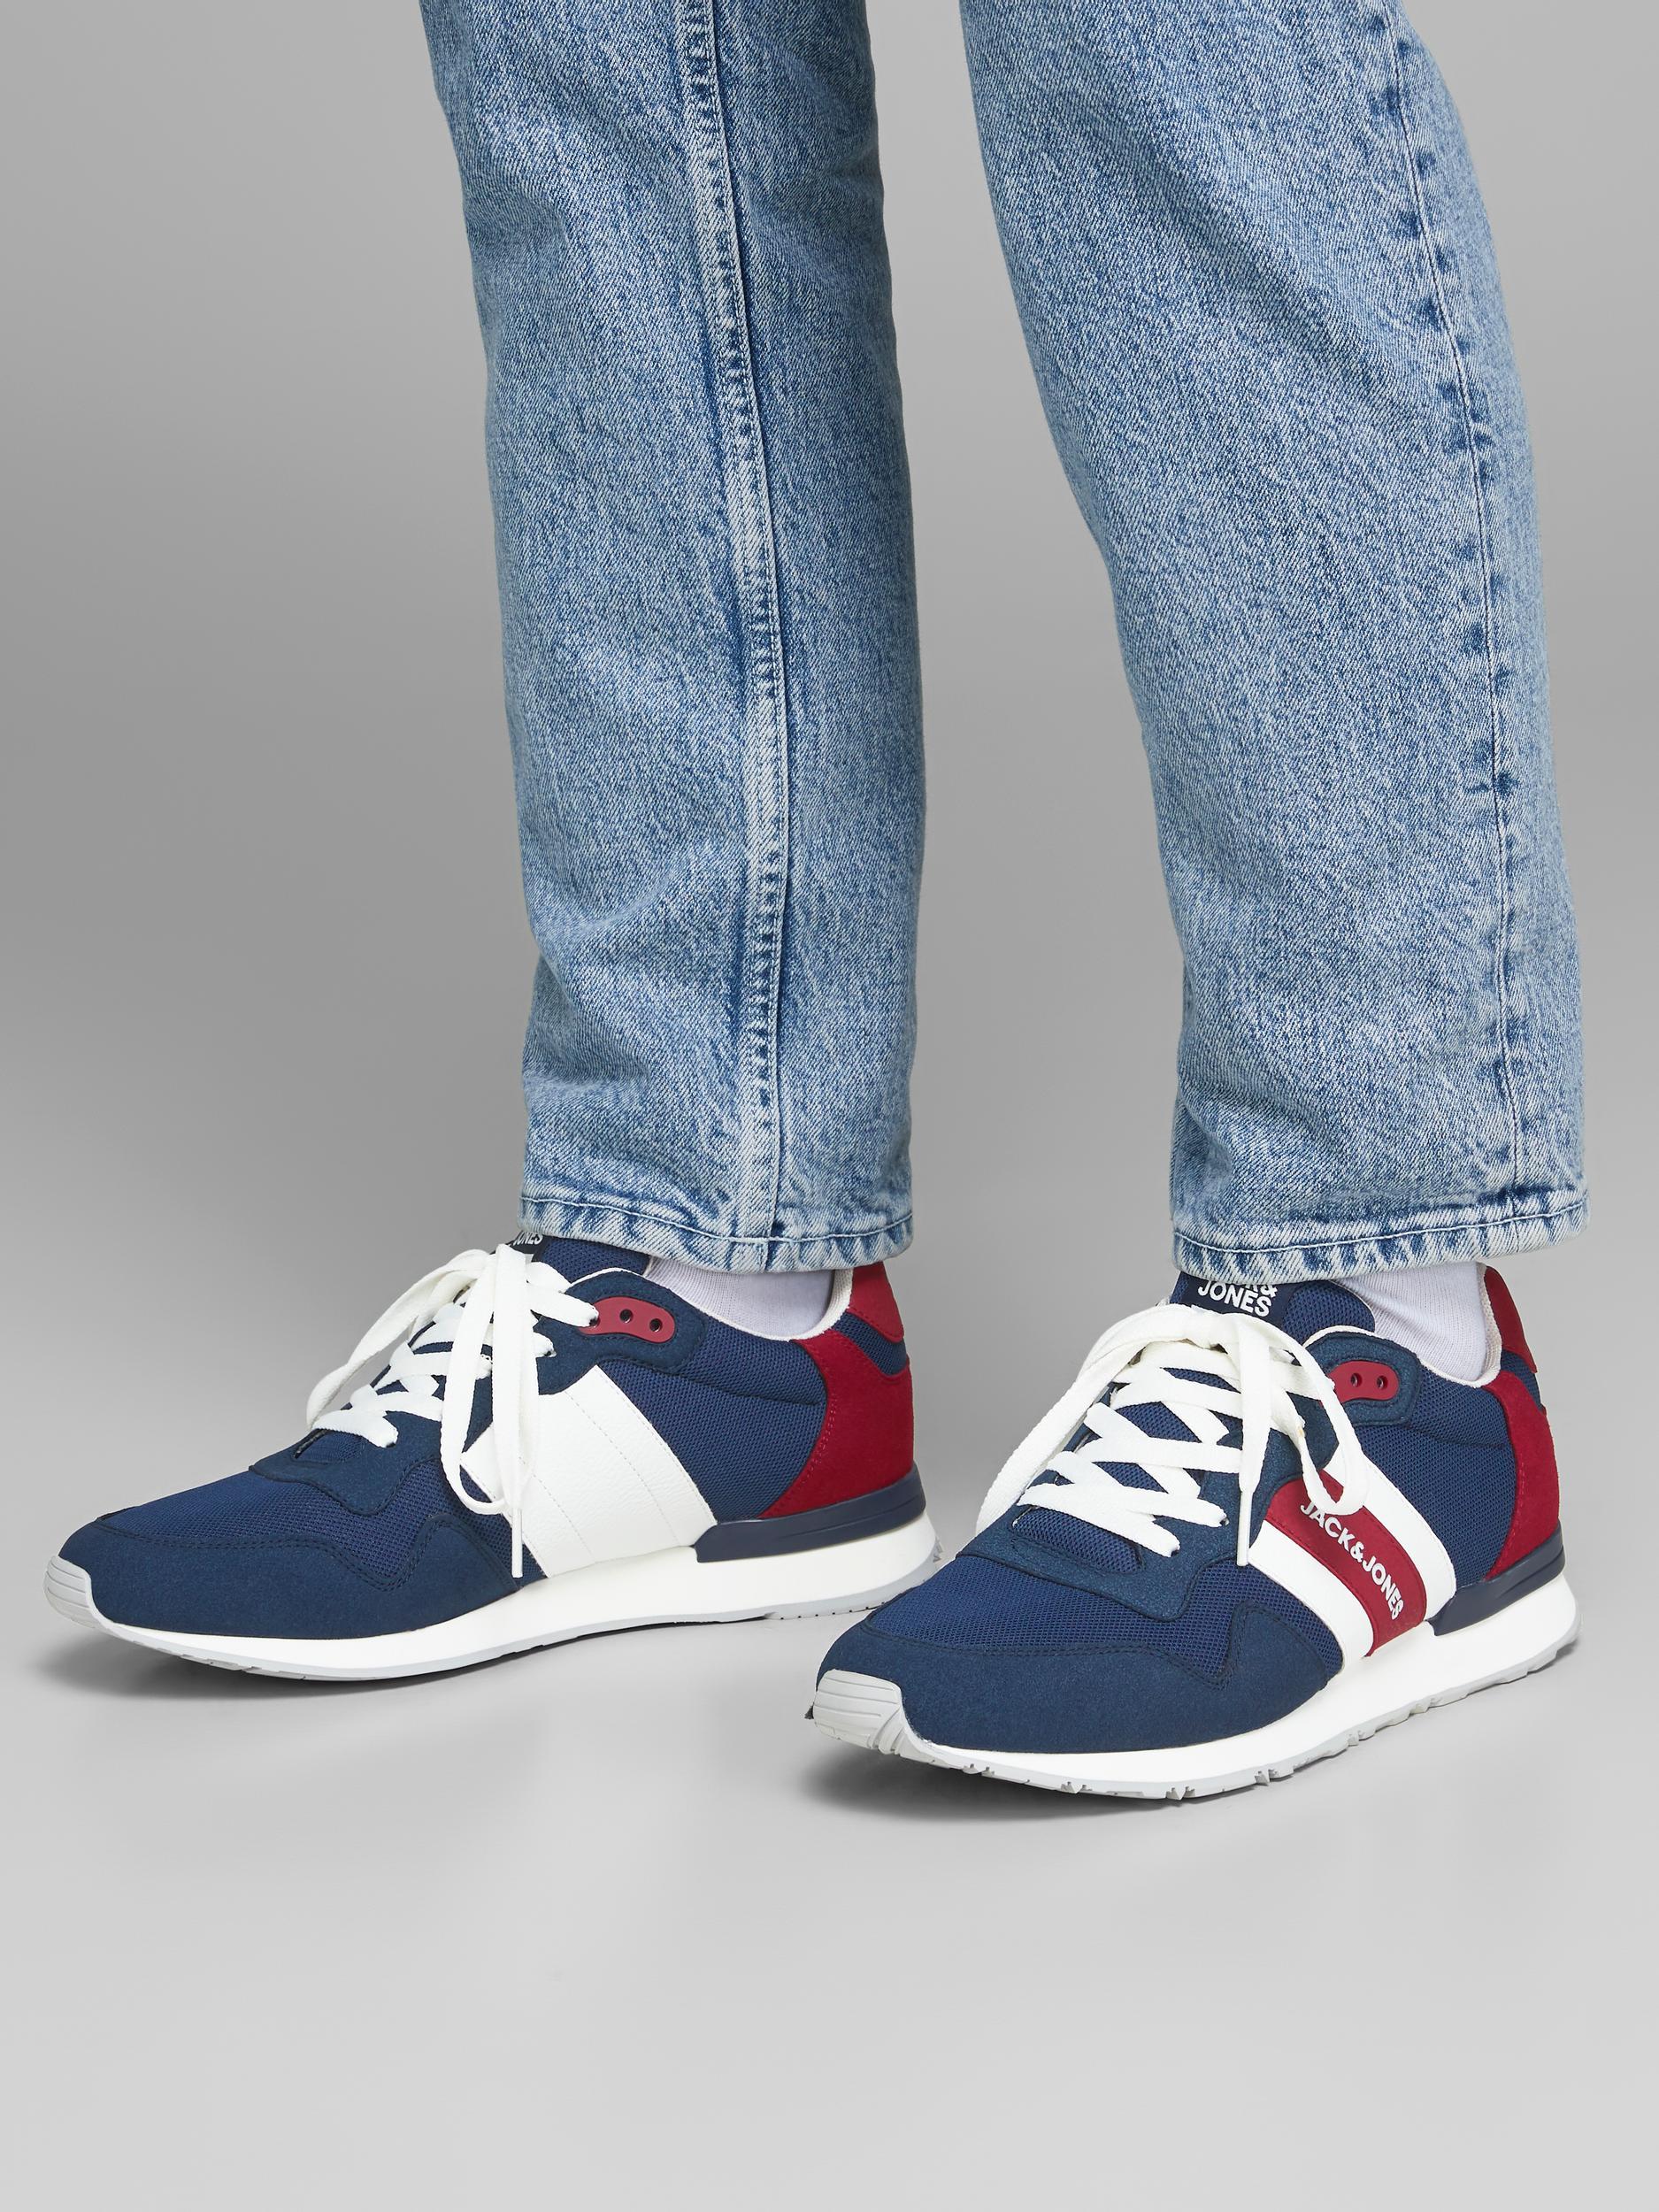 Jack & Jones Stellar Mesh sneakers, majolica blue, 46